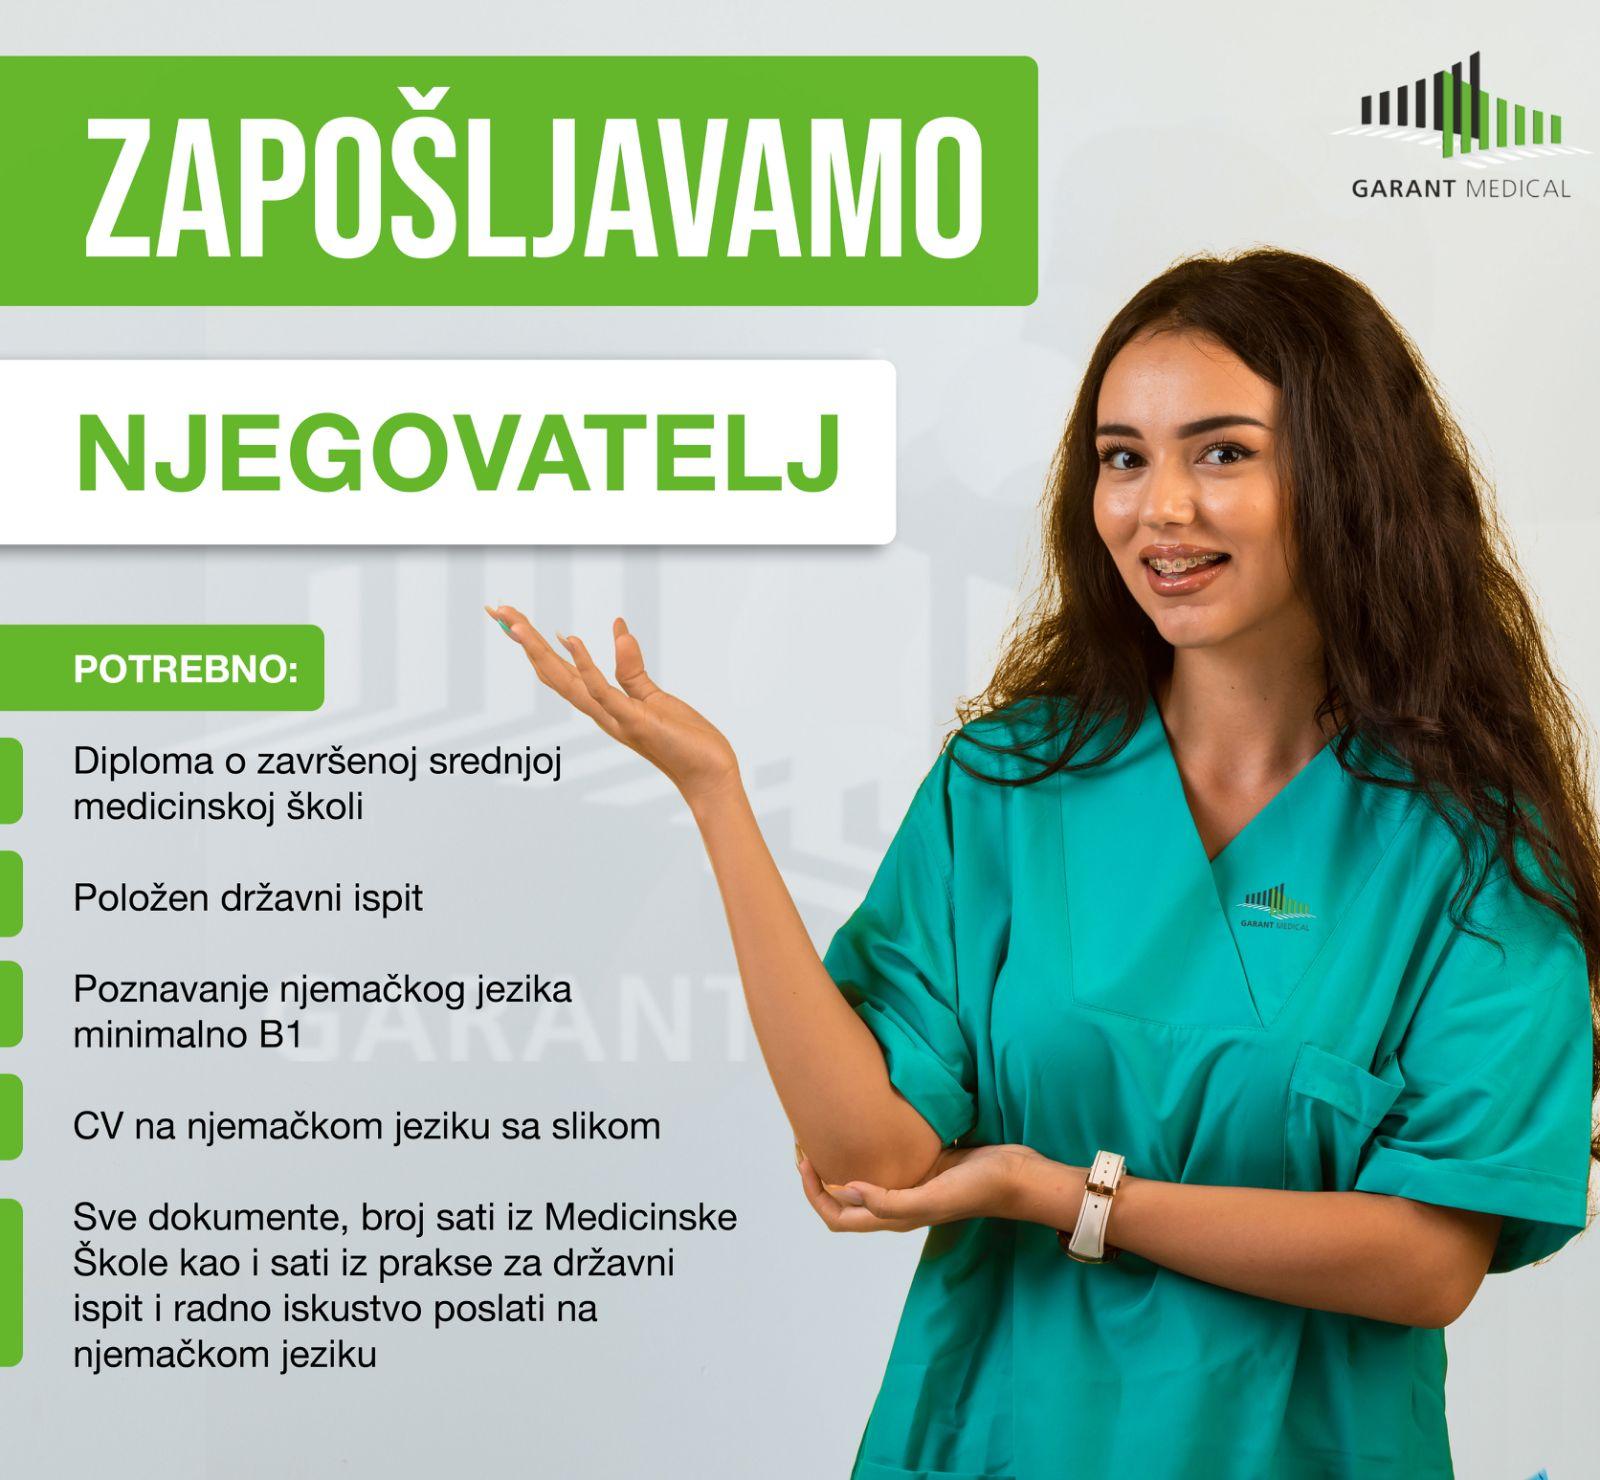 Garant Medical lansirao novu intekrativnu web platformu